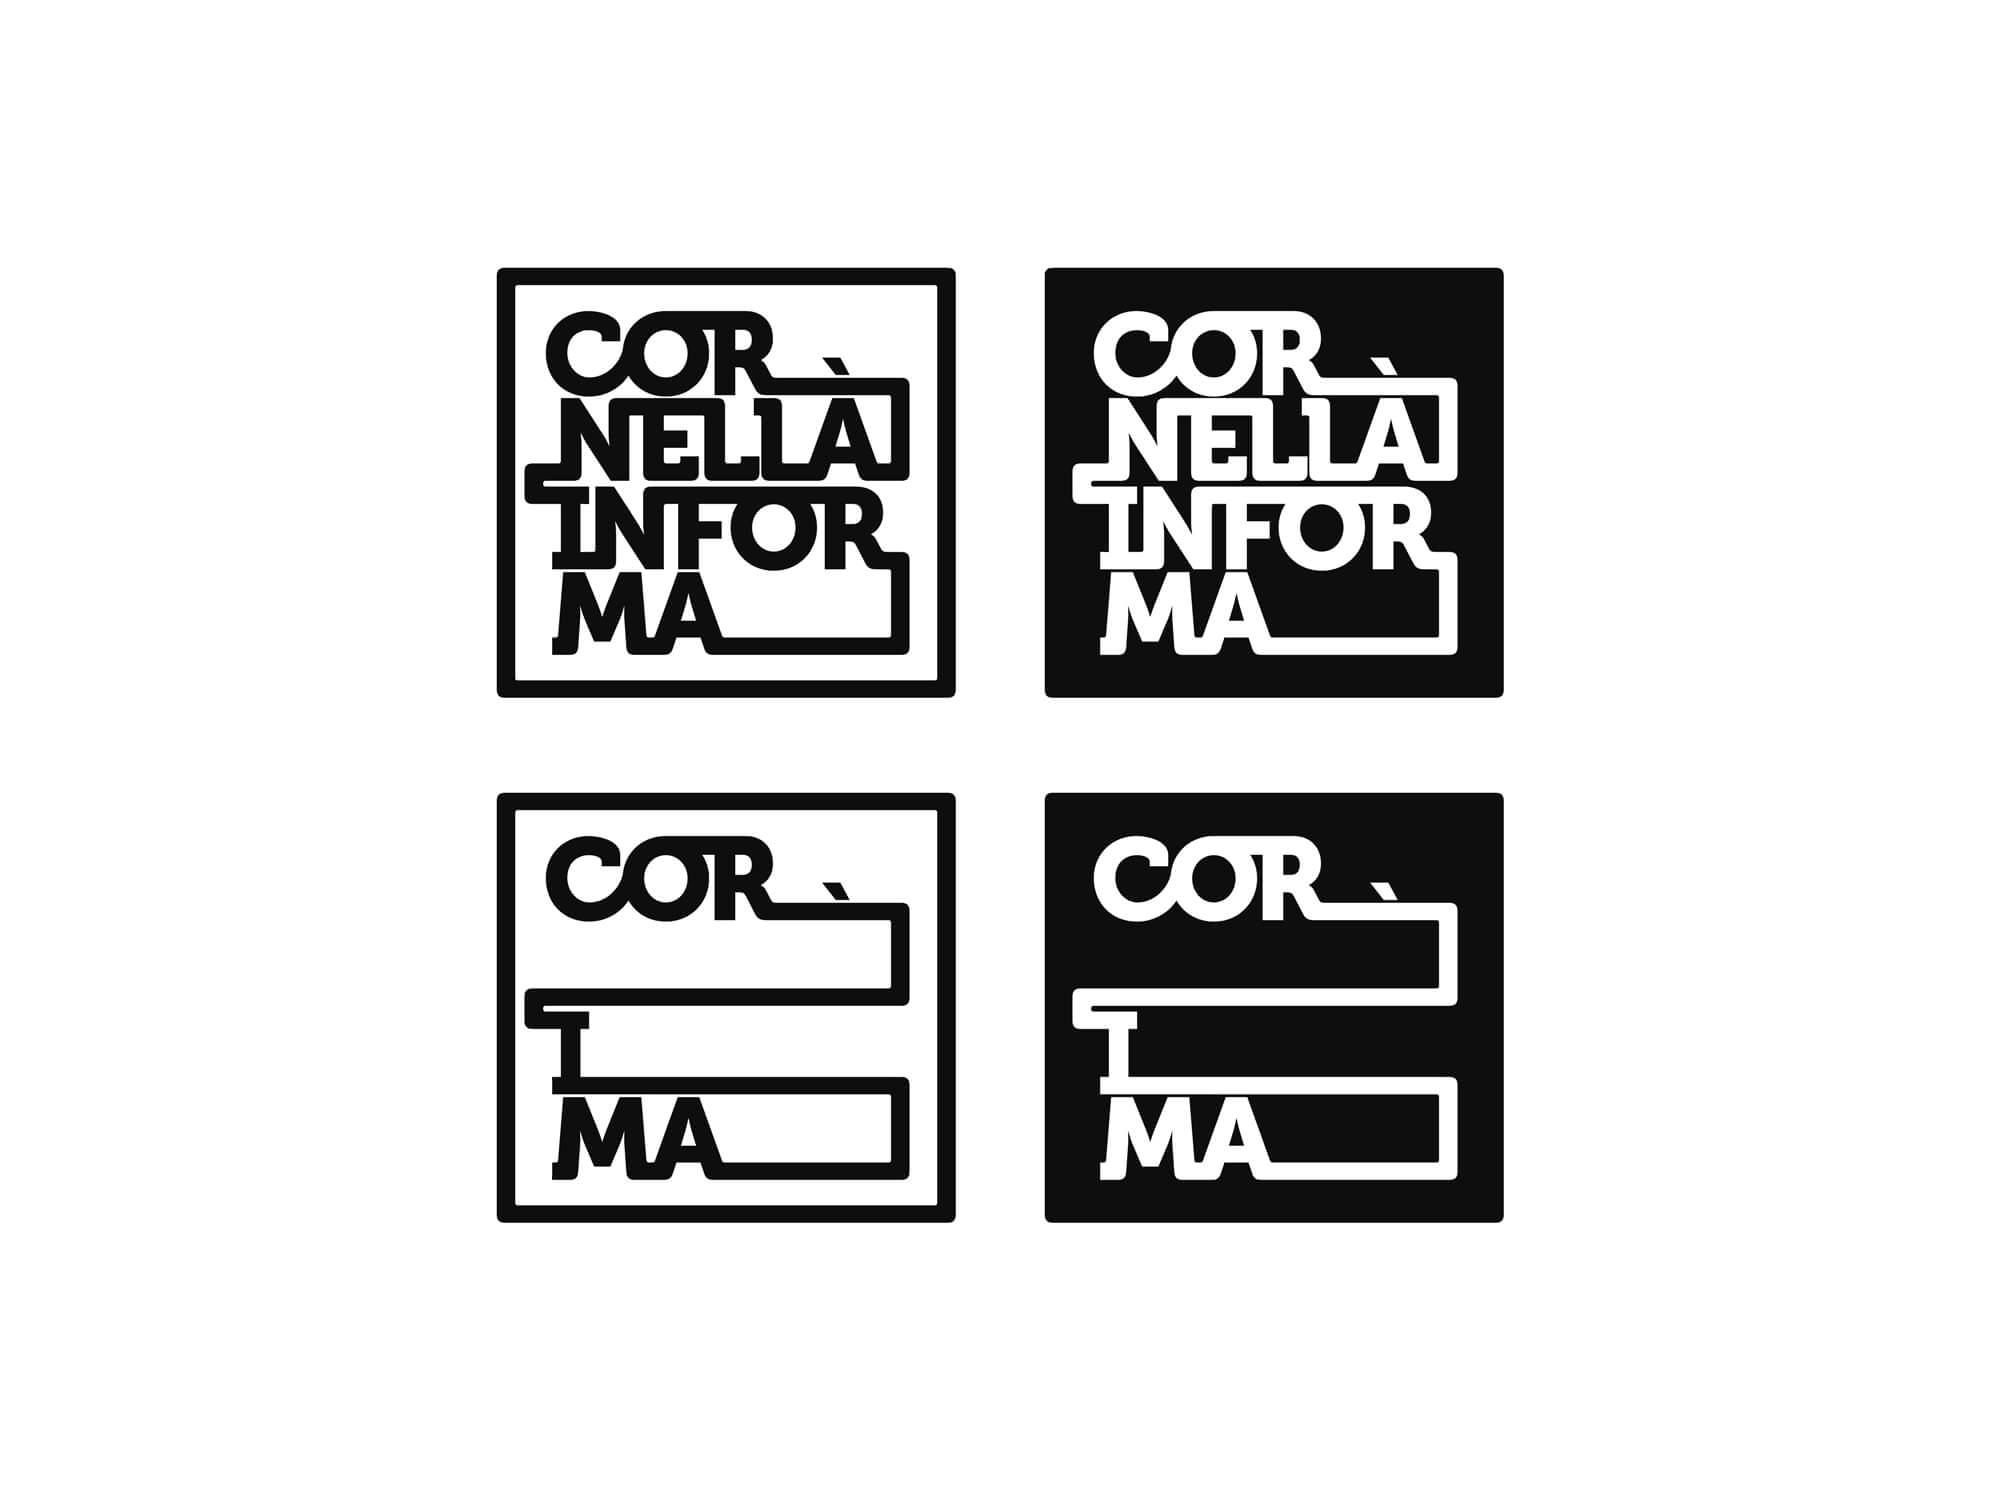 laNegreta-CornellaInforma-Logotip-7.jpg